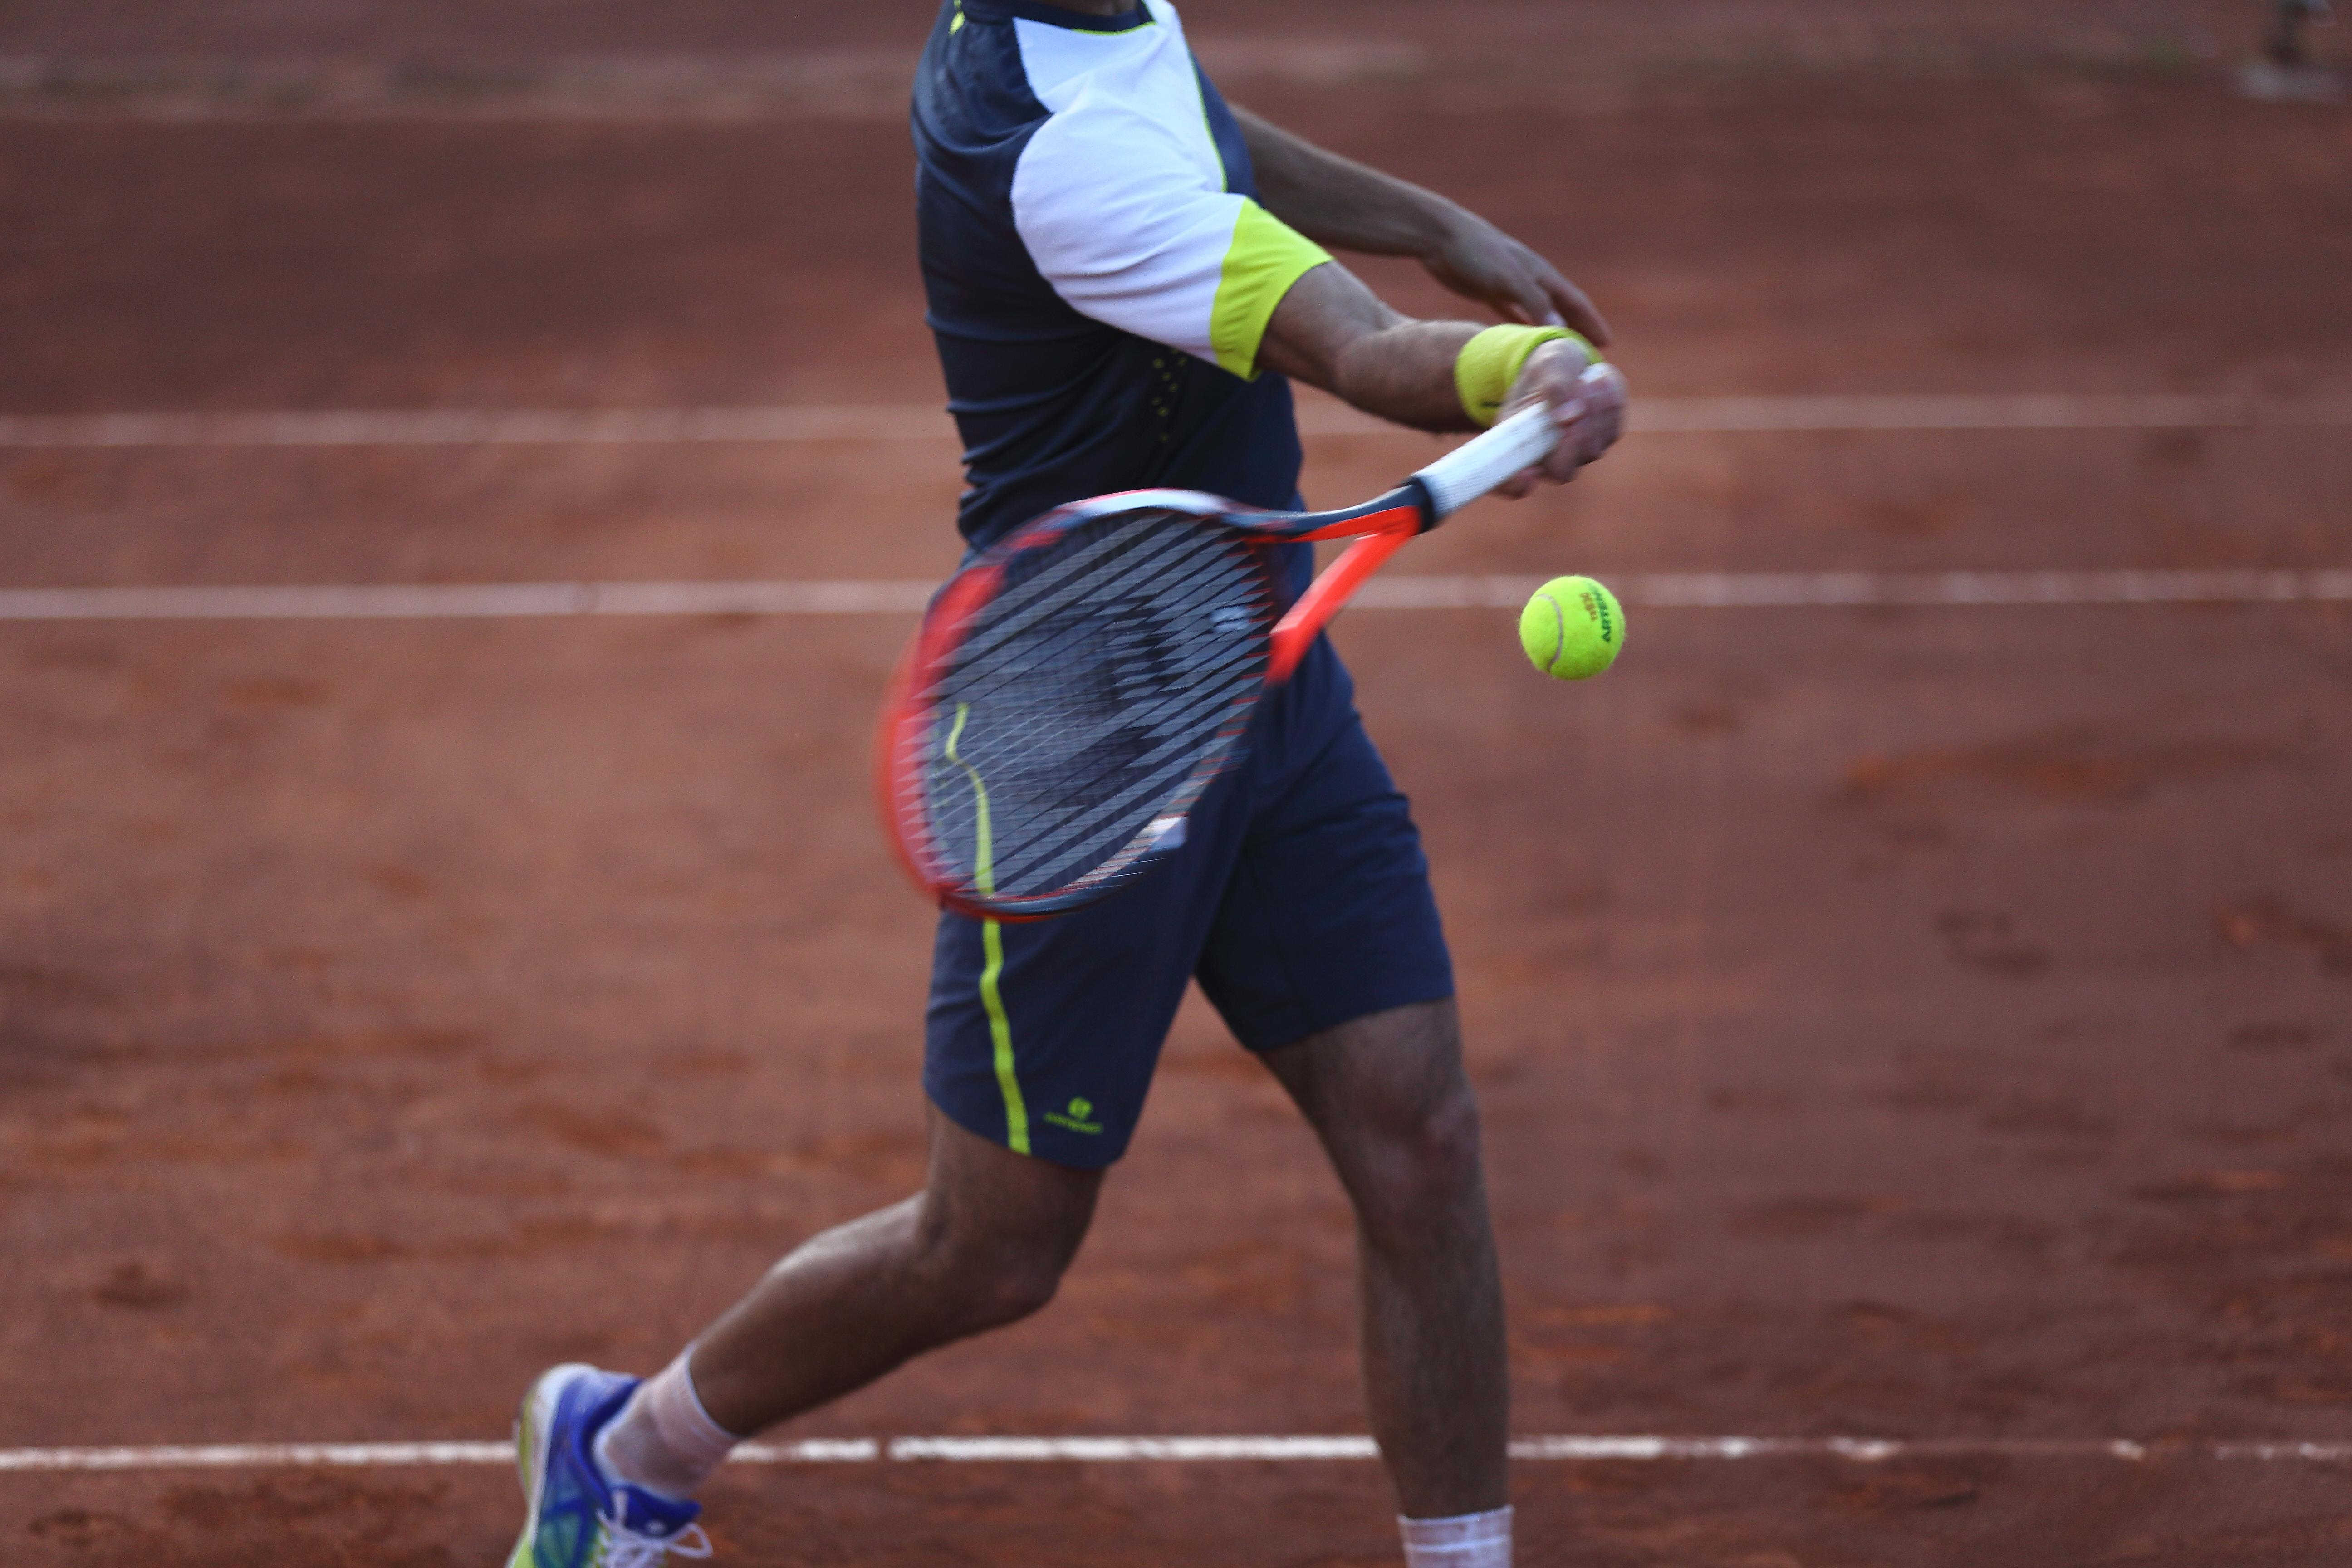 tennis_balle_bcn_2014_g78q7749